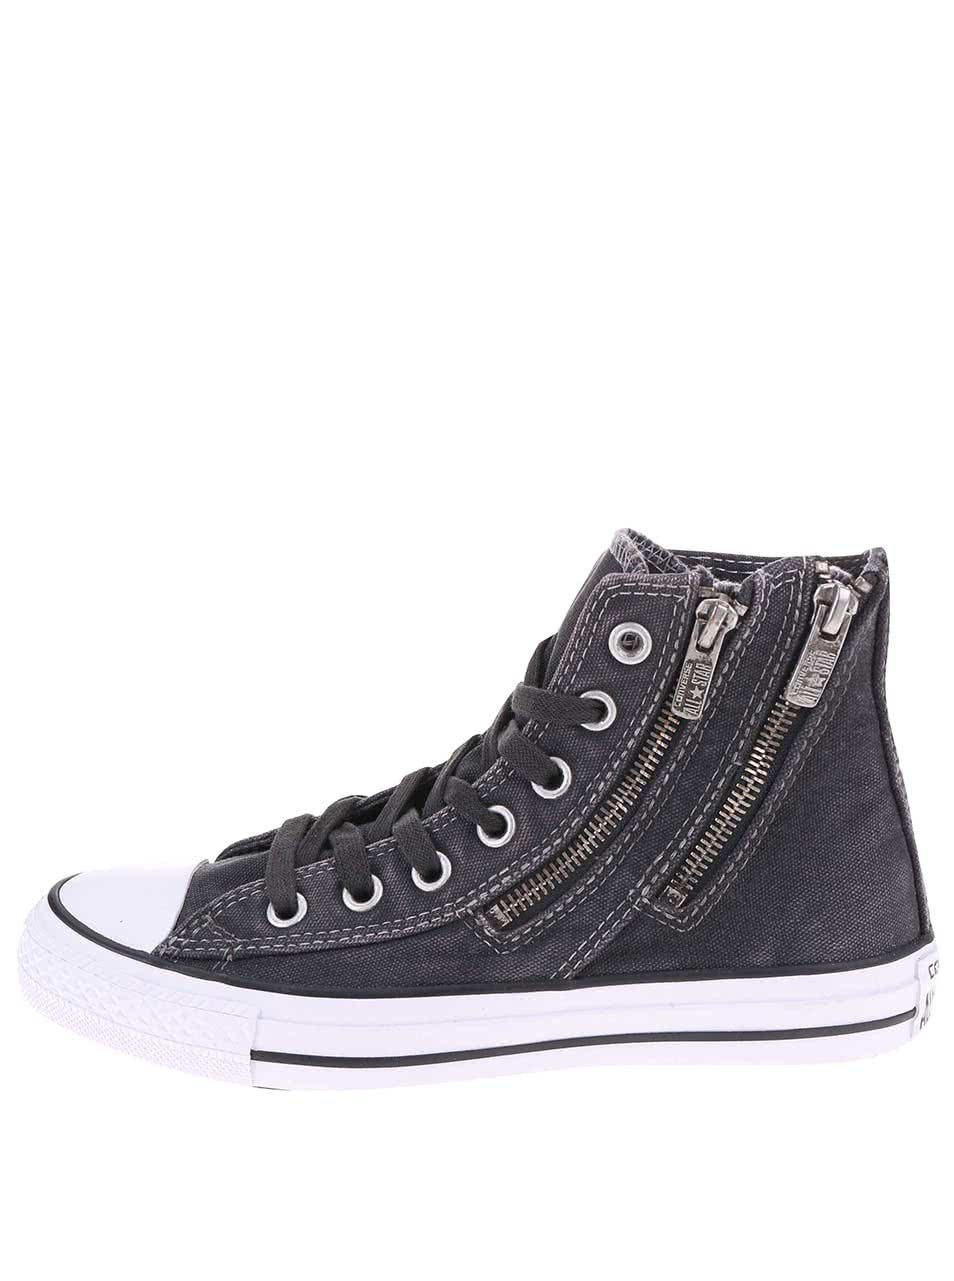 Černé dámské žíhané tenisky Converse Chuck Taylor Dual Zip ... 0c69ad687c